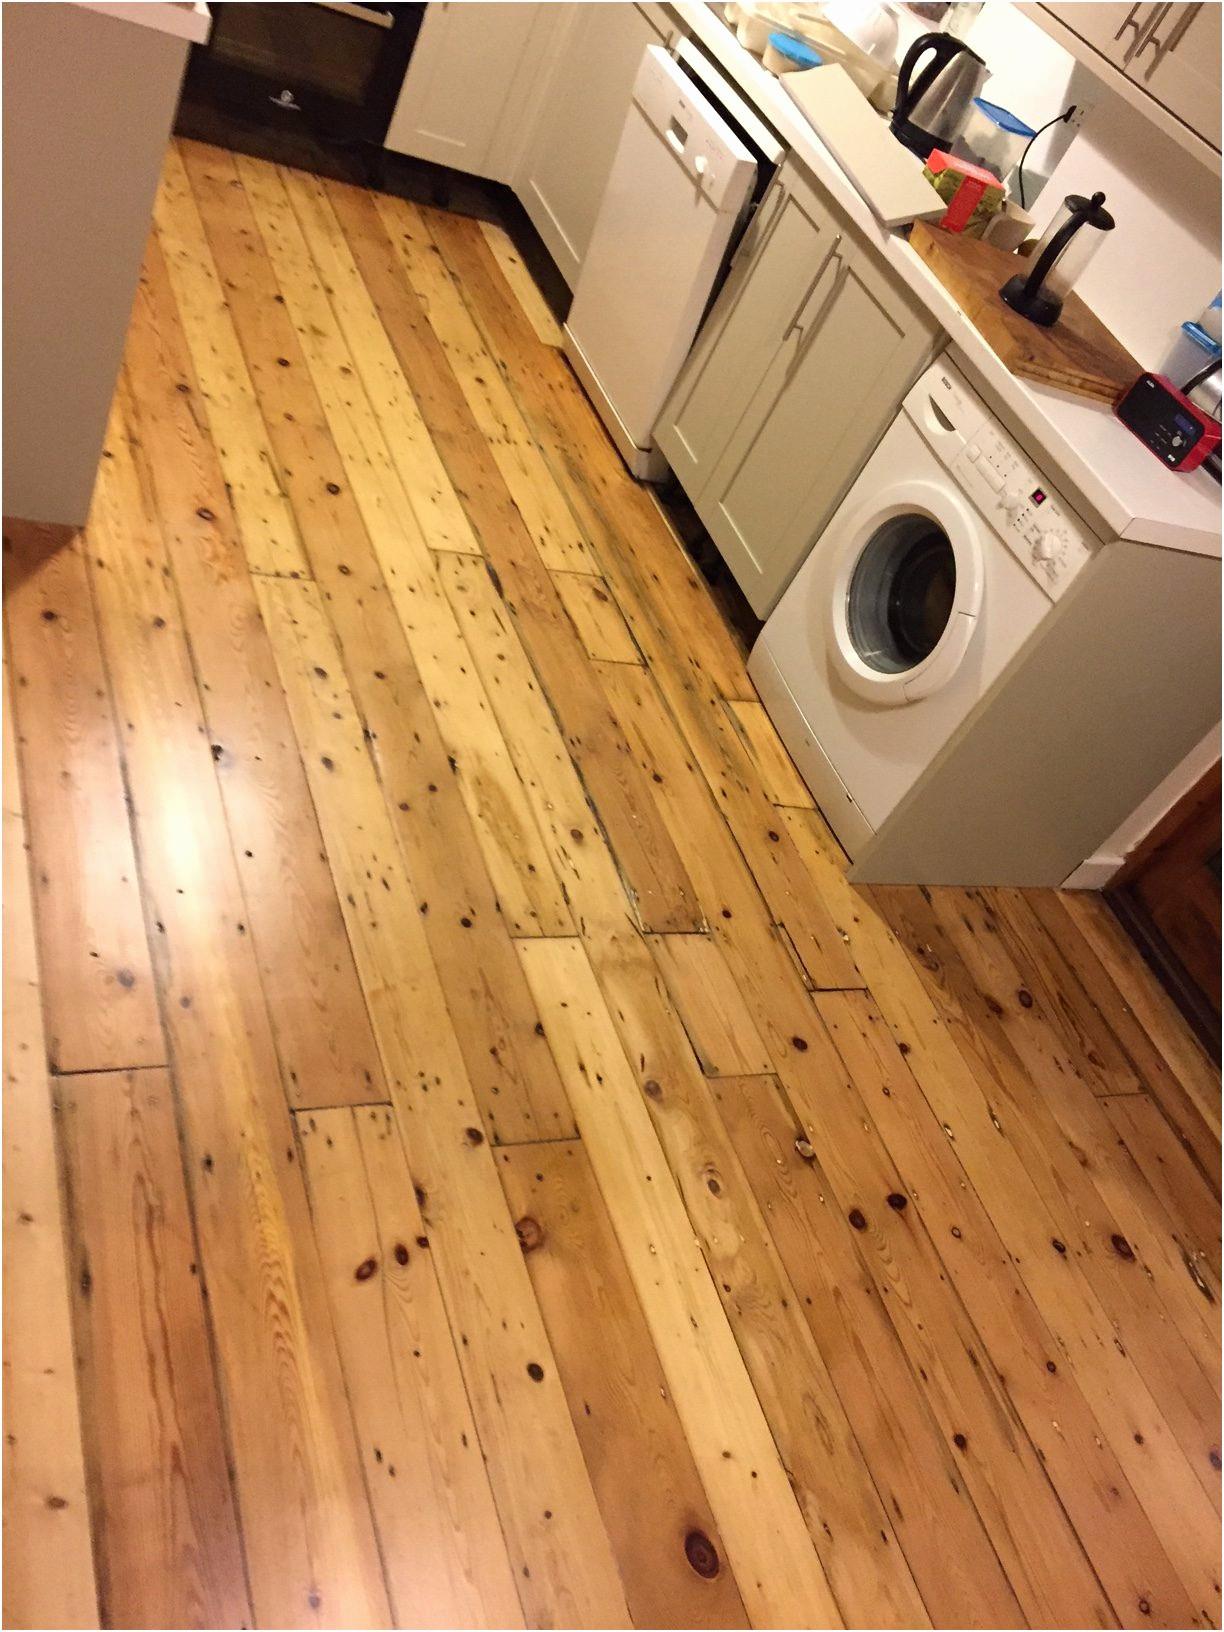 laminate or hardwood flooring of flooring nj elegant floor 40 luxury floor installation sets re with flooring nj luxury what is laminate wood flooring fresh 0d grace place barnegat nj